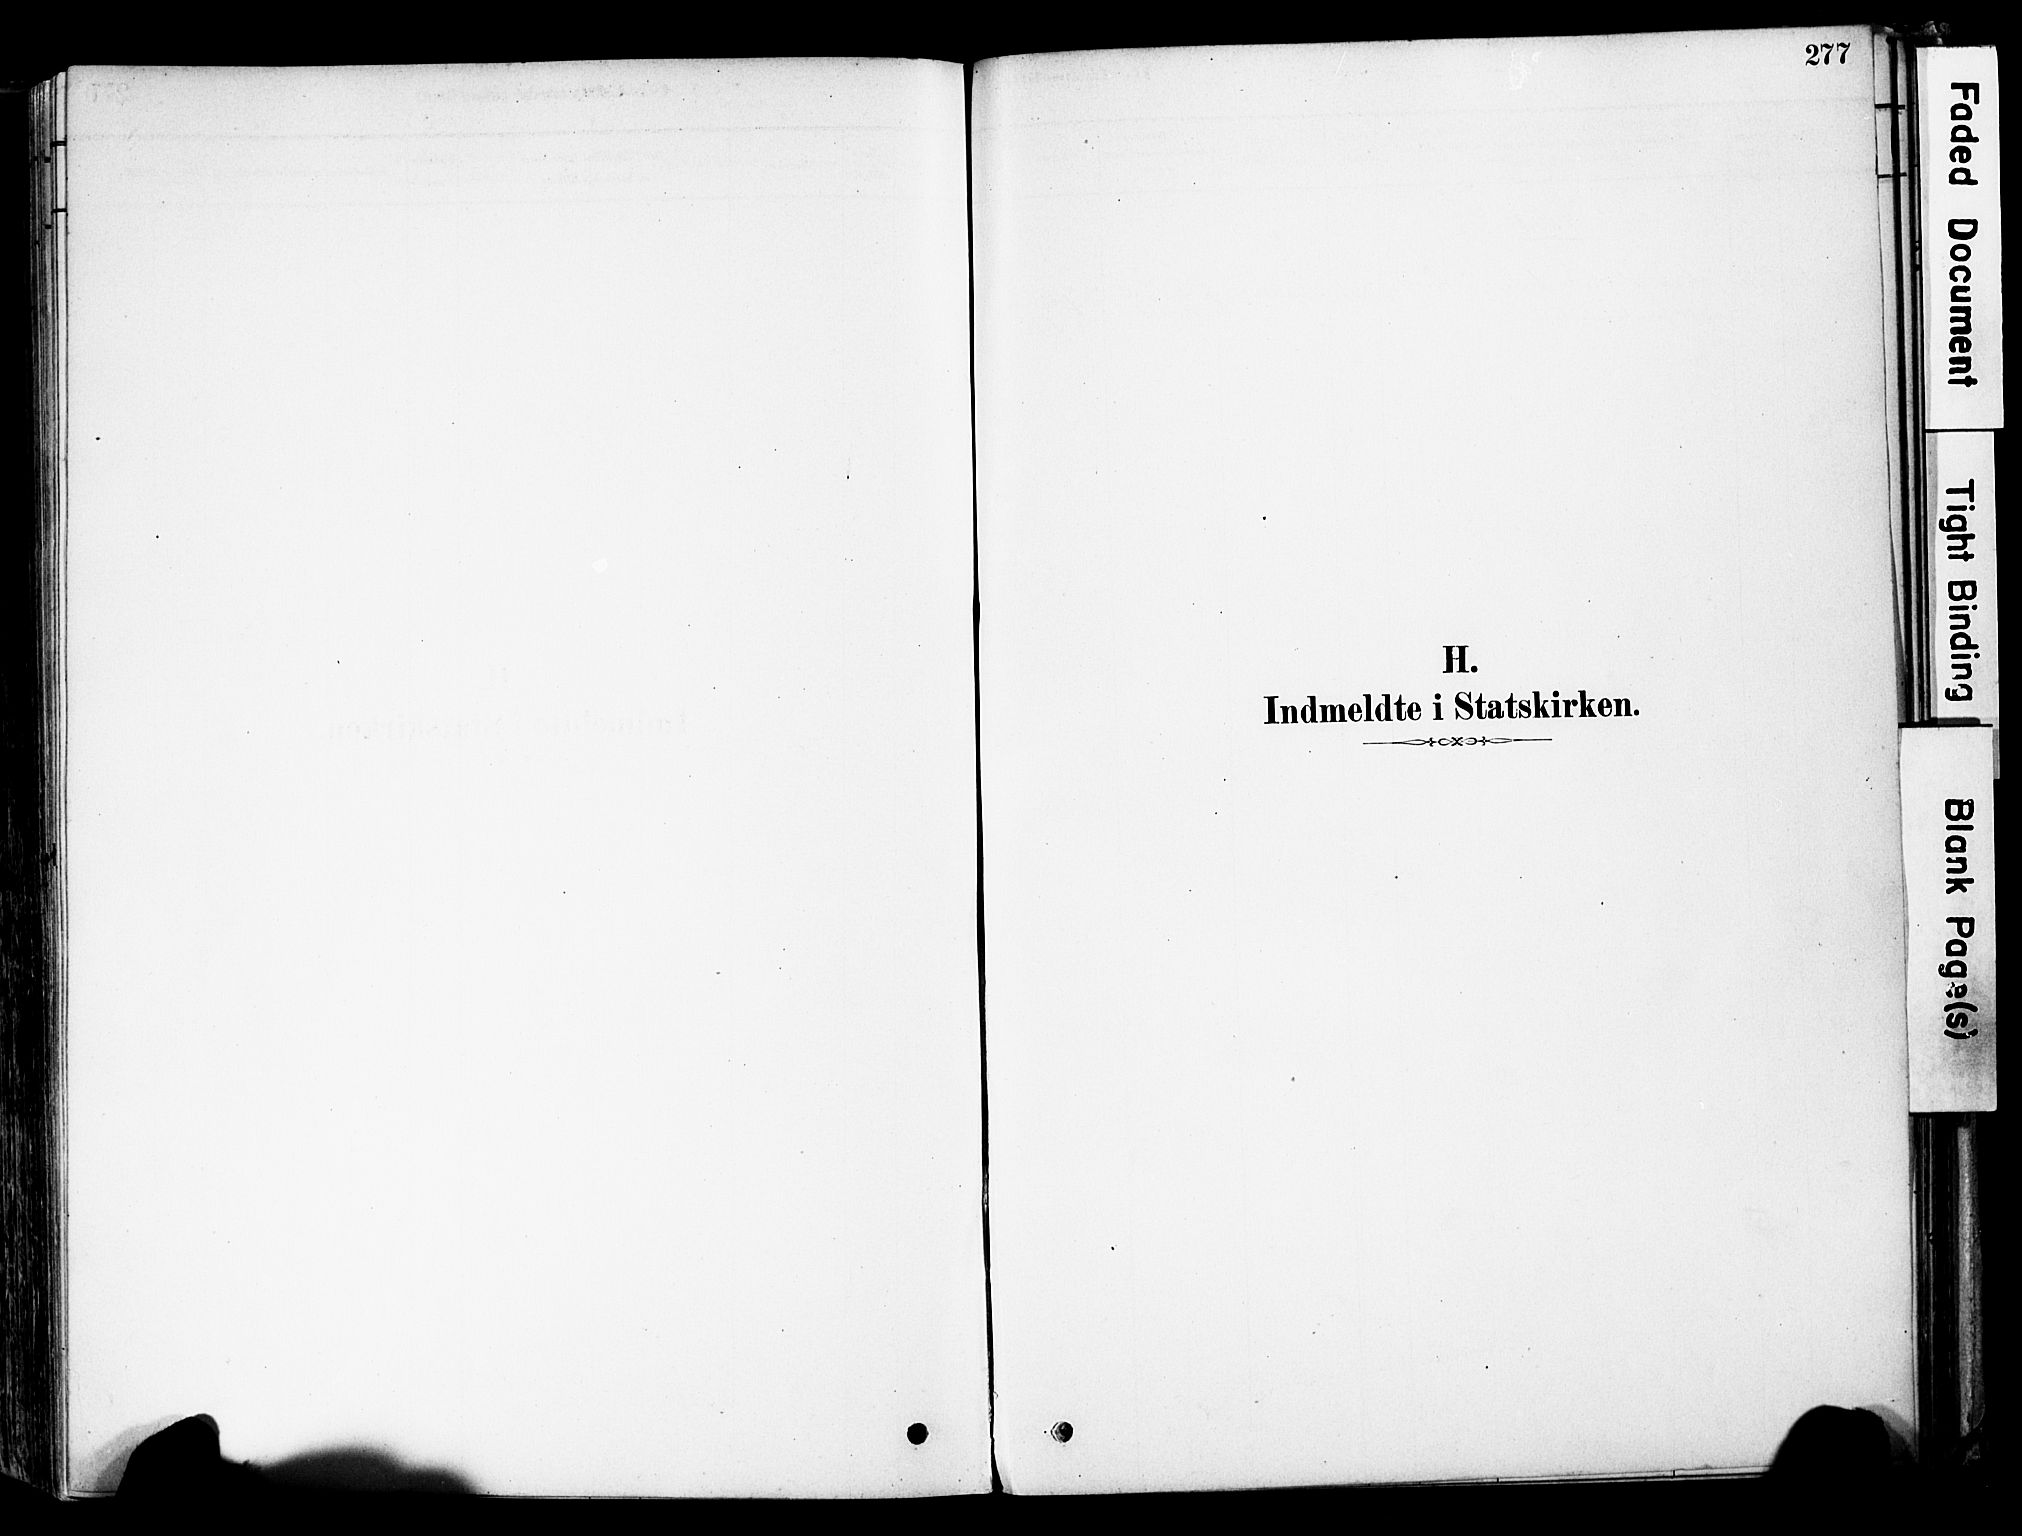 SAH, Øyer prestekontor, Ministerialbok nr. 8, 1878-1897, s. 277